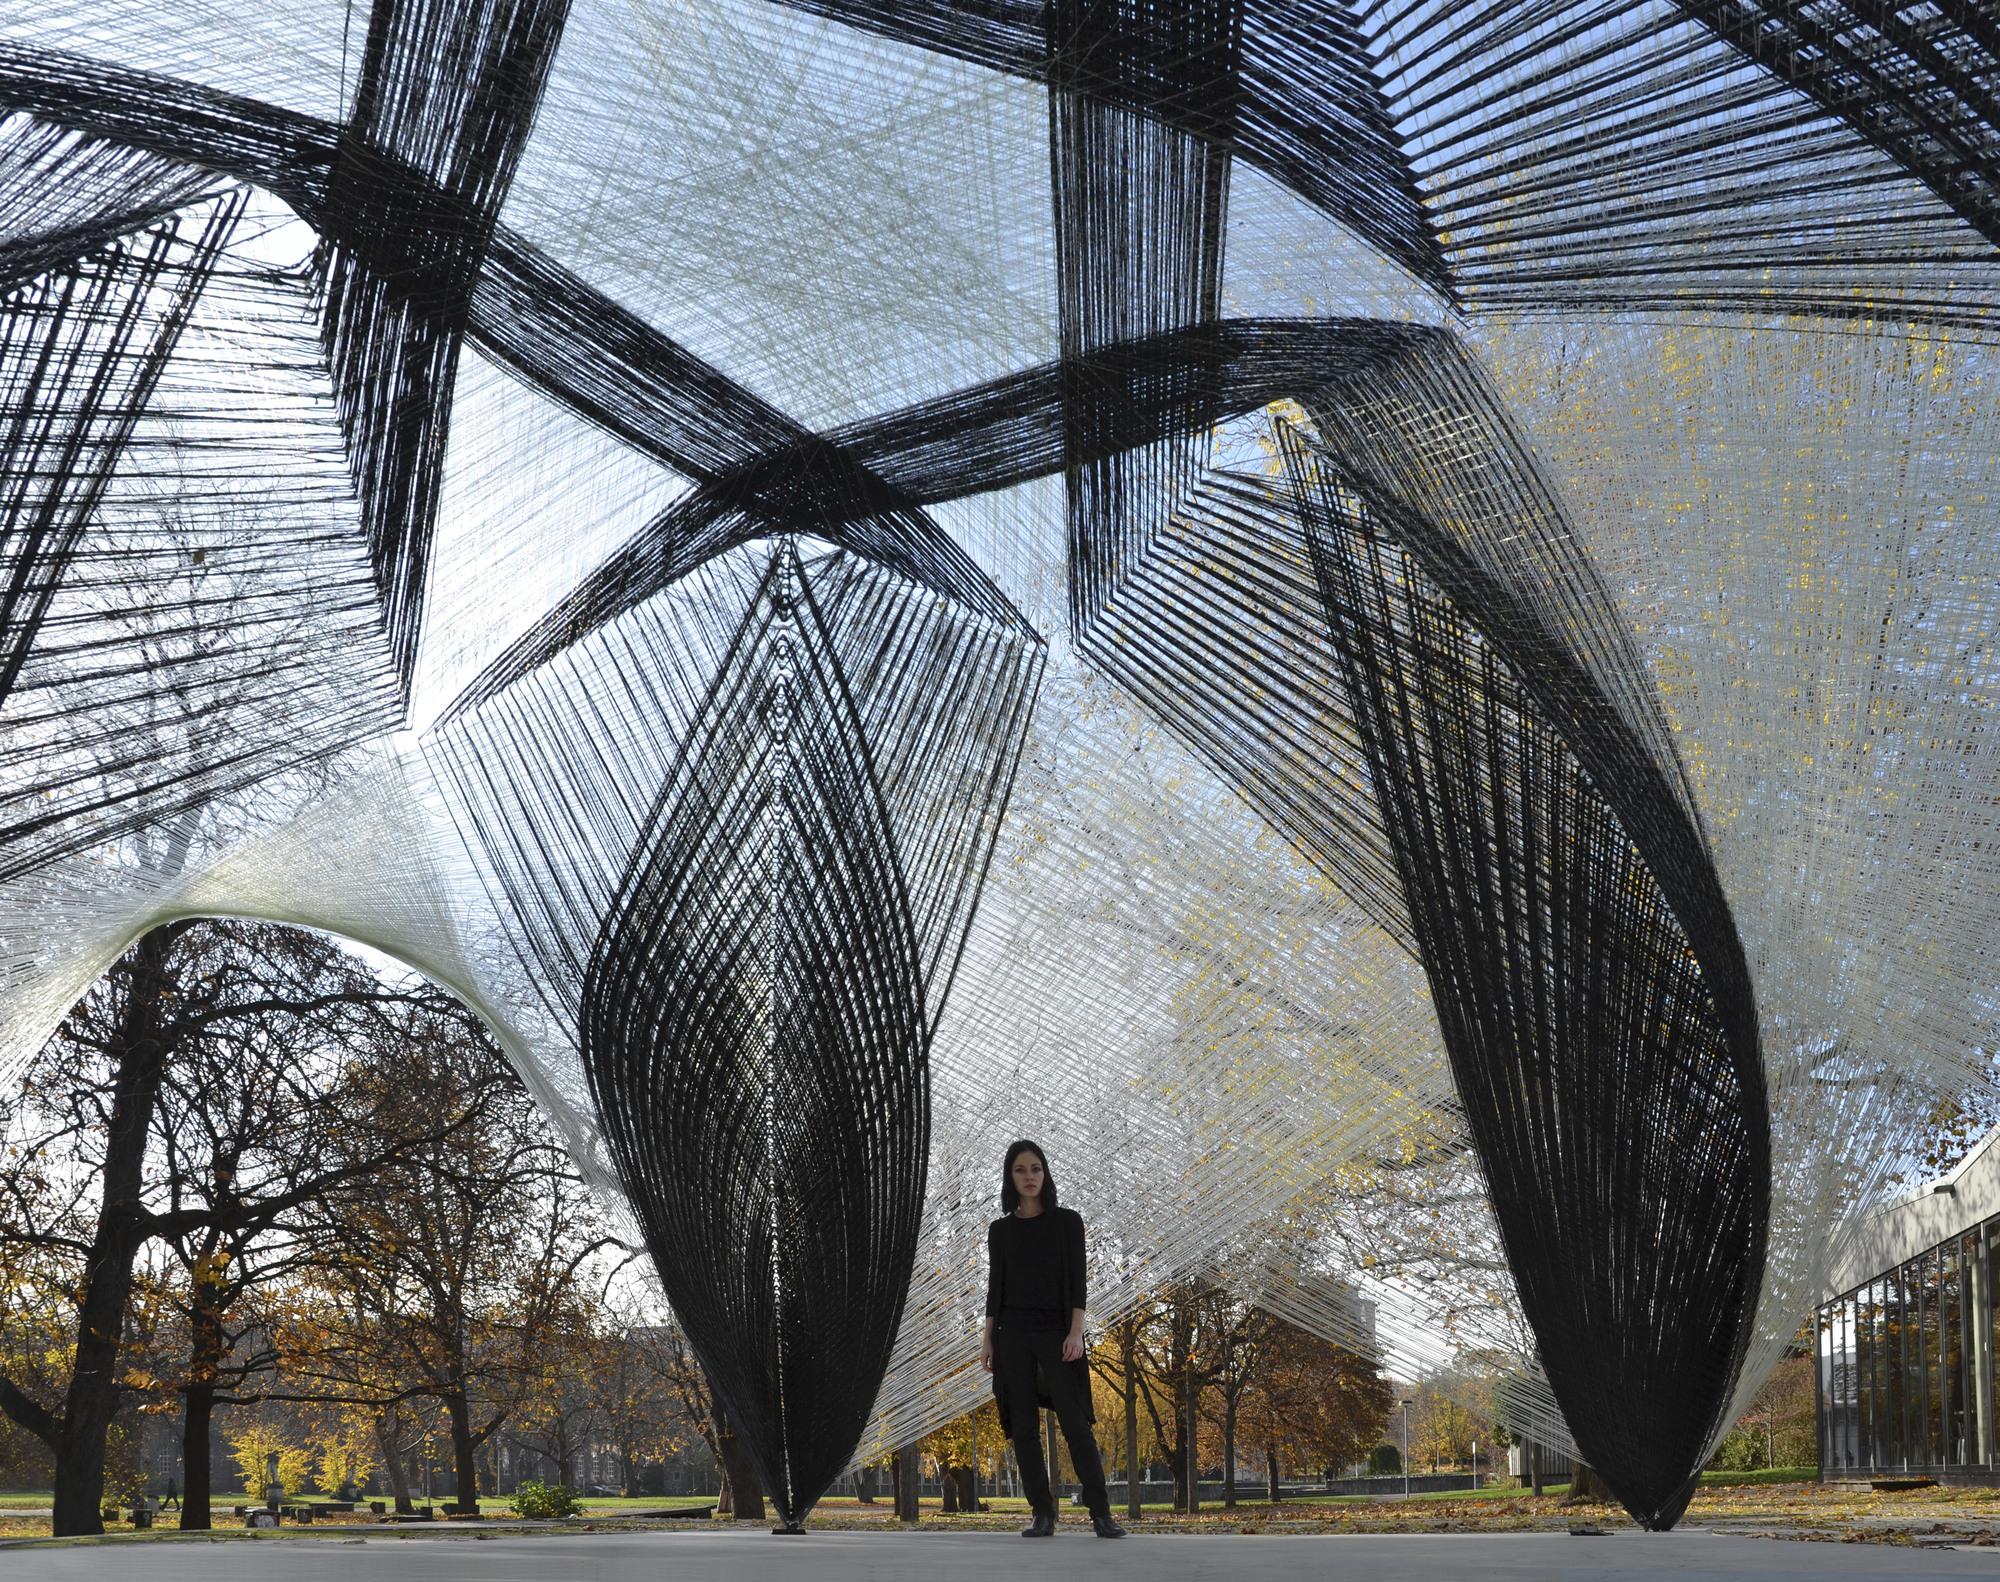 Architects Stuttgart icd itke research pavilion 2012 stuttgart germany aeworldmap